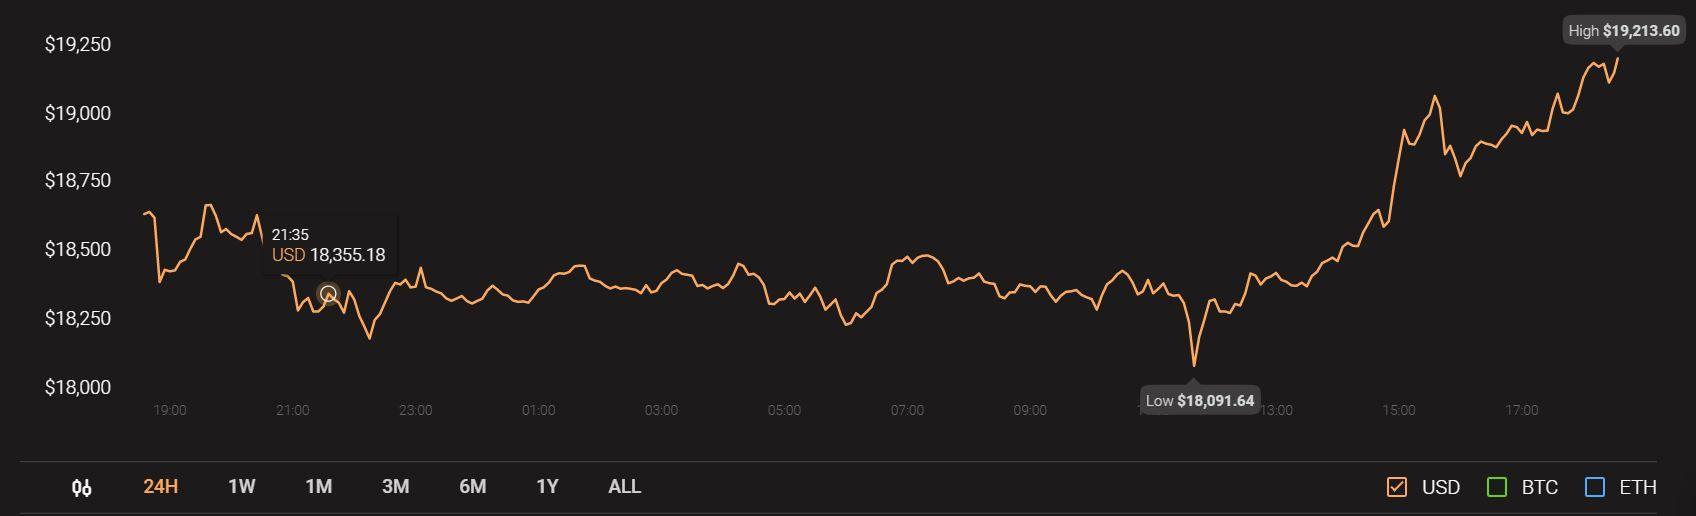 Polkadot Monero Dogecoin Price Analysis 24 November Cryptocurrency Altcoins Analysis Doge Dot Analysis Polka Dots Rsi